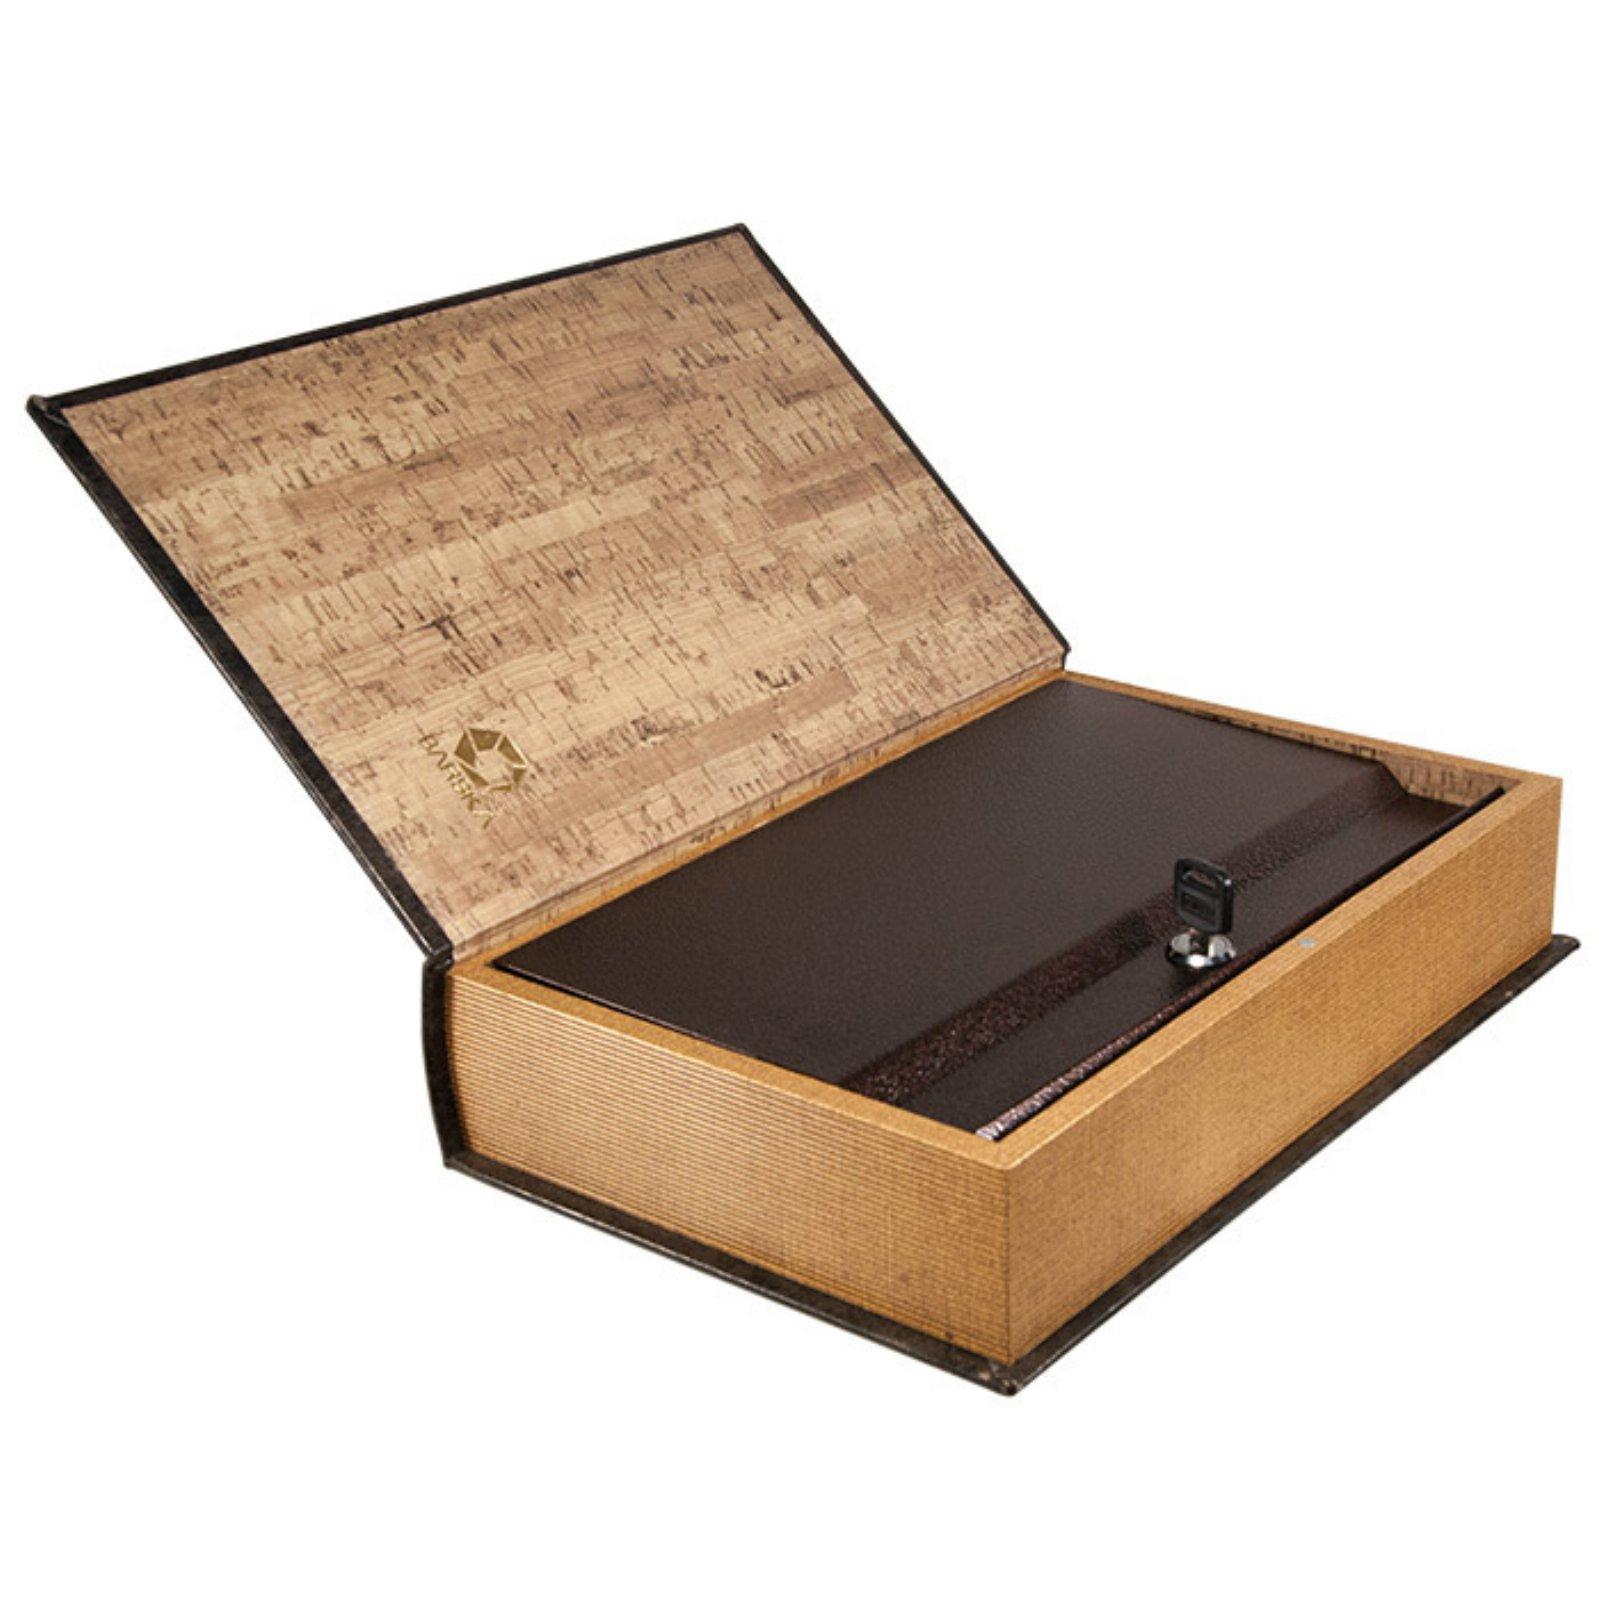 Barska Optics Book Safe with Key, Large Antique